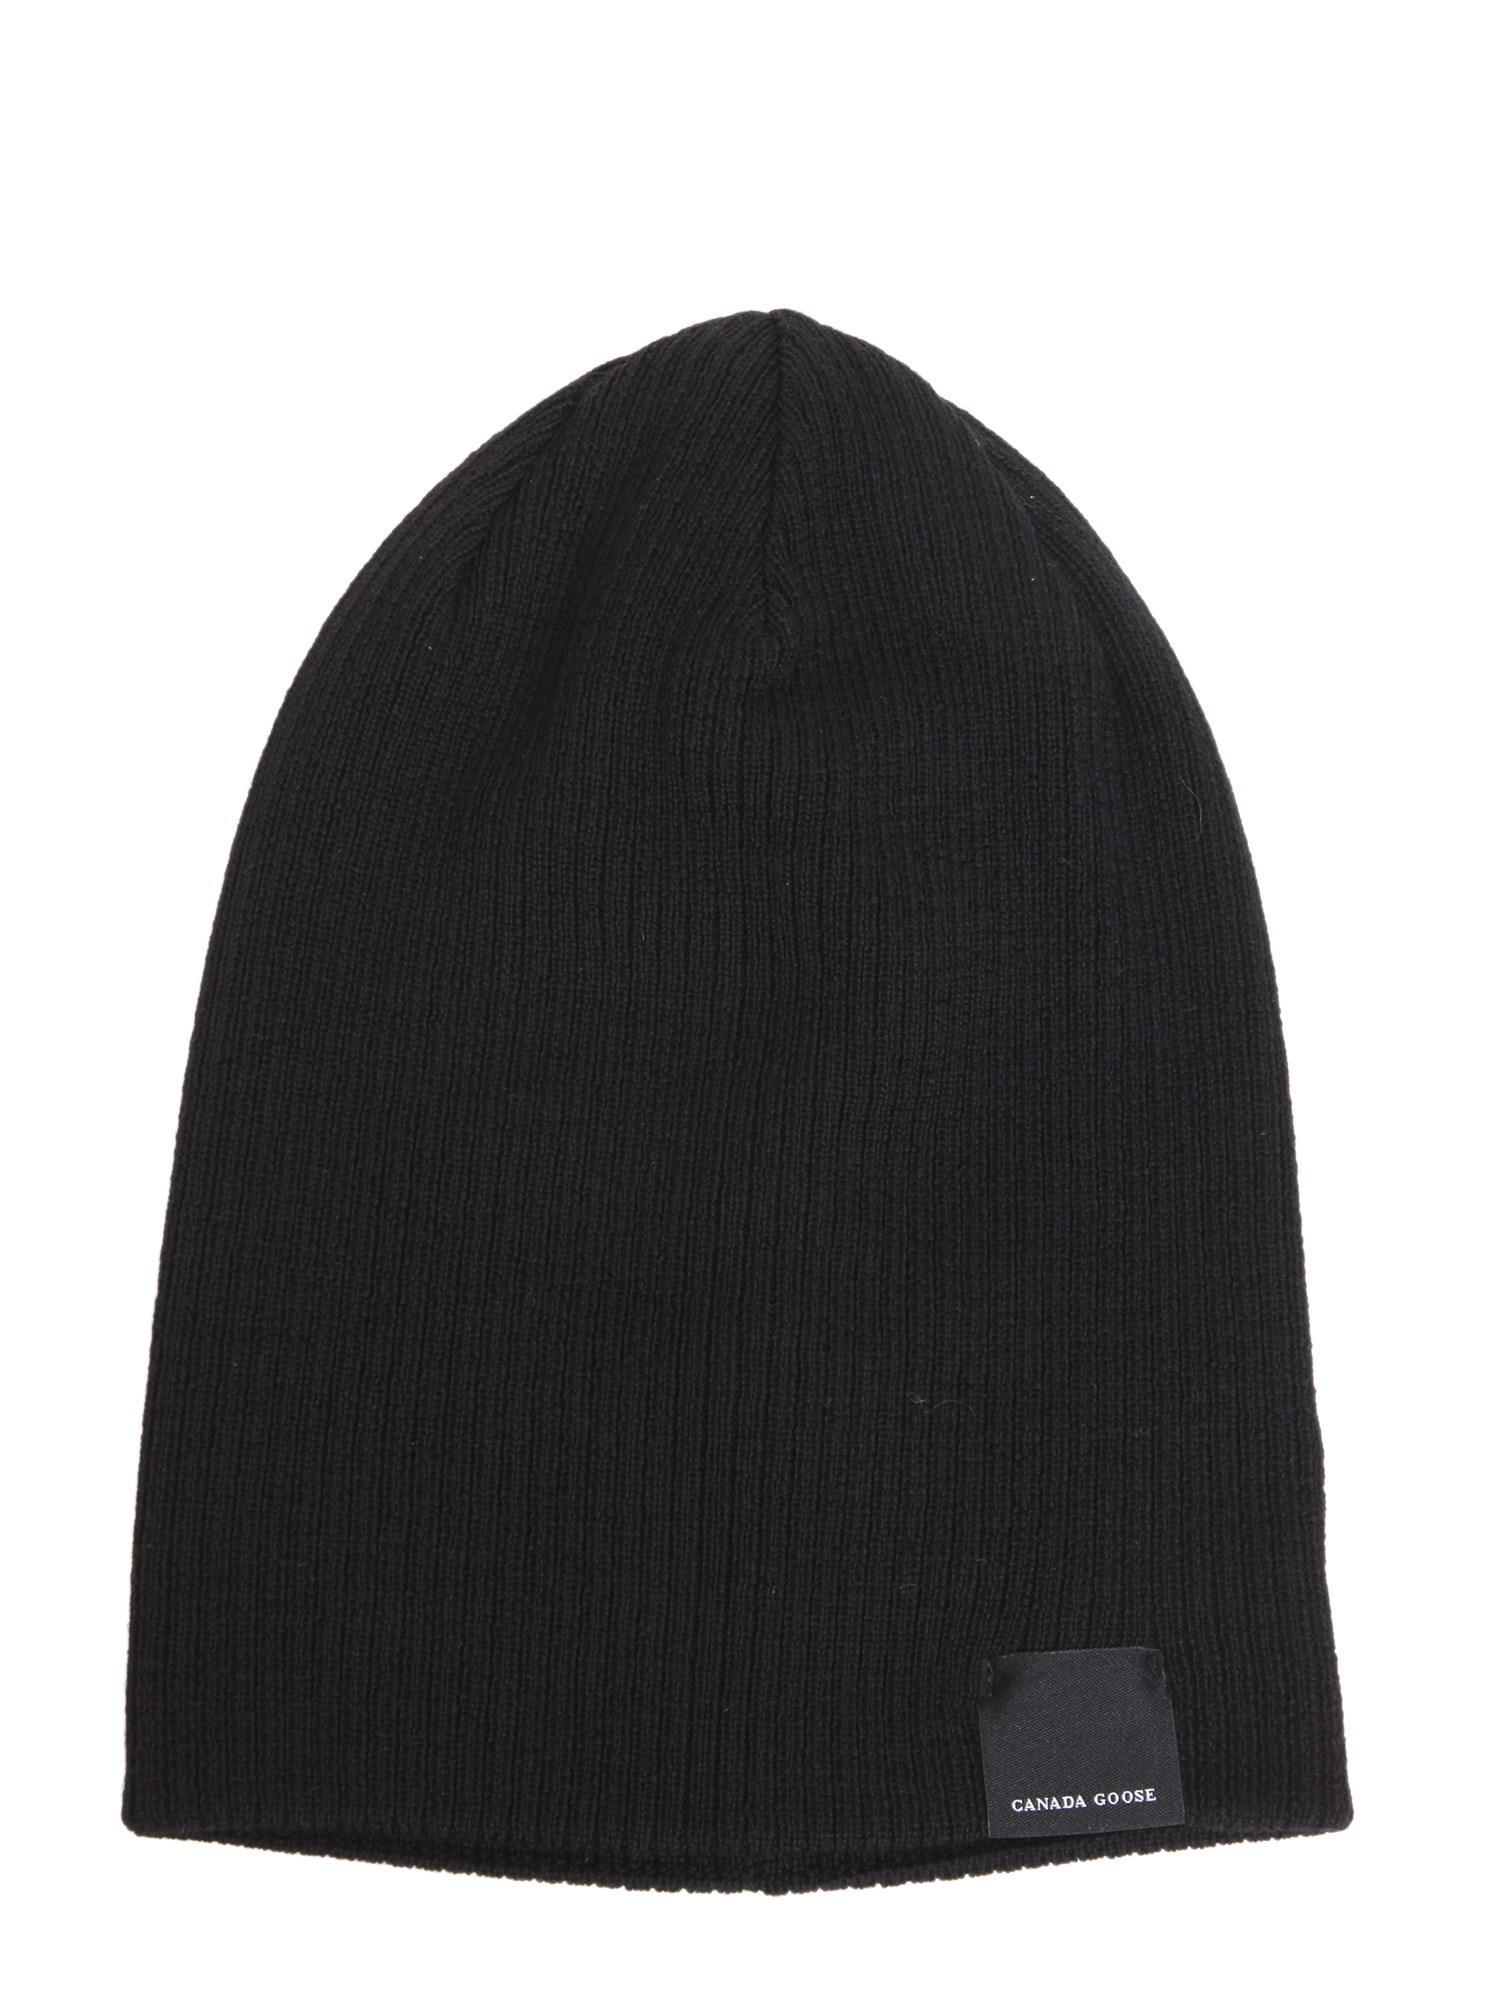 a61741df320 Canada Goose - Black Cappello Reversibile In Lana Merino for Men - Lyst.  View fullscreen